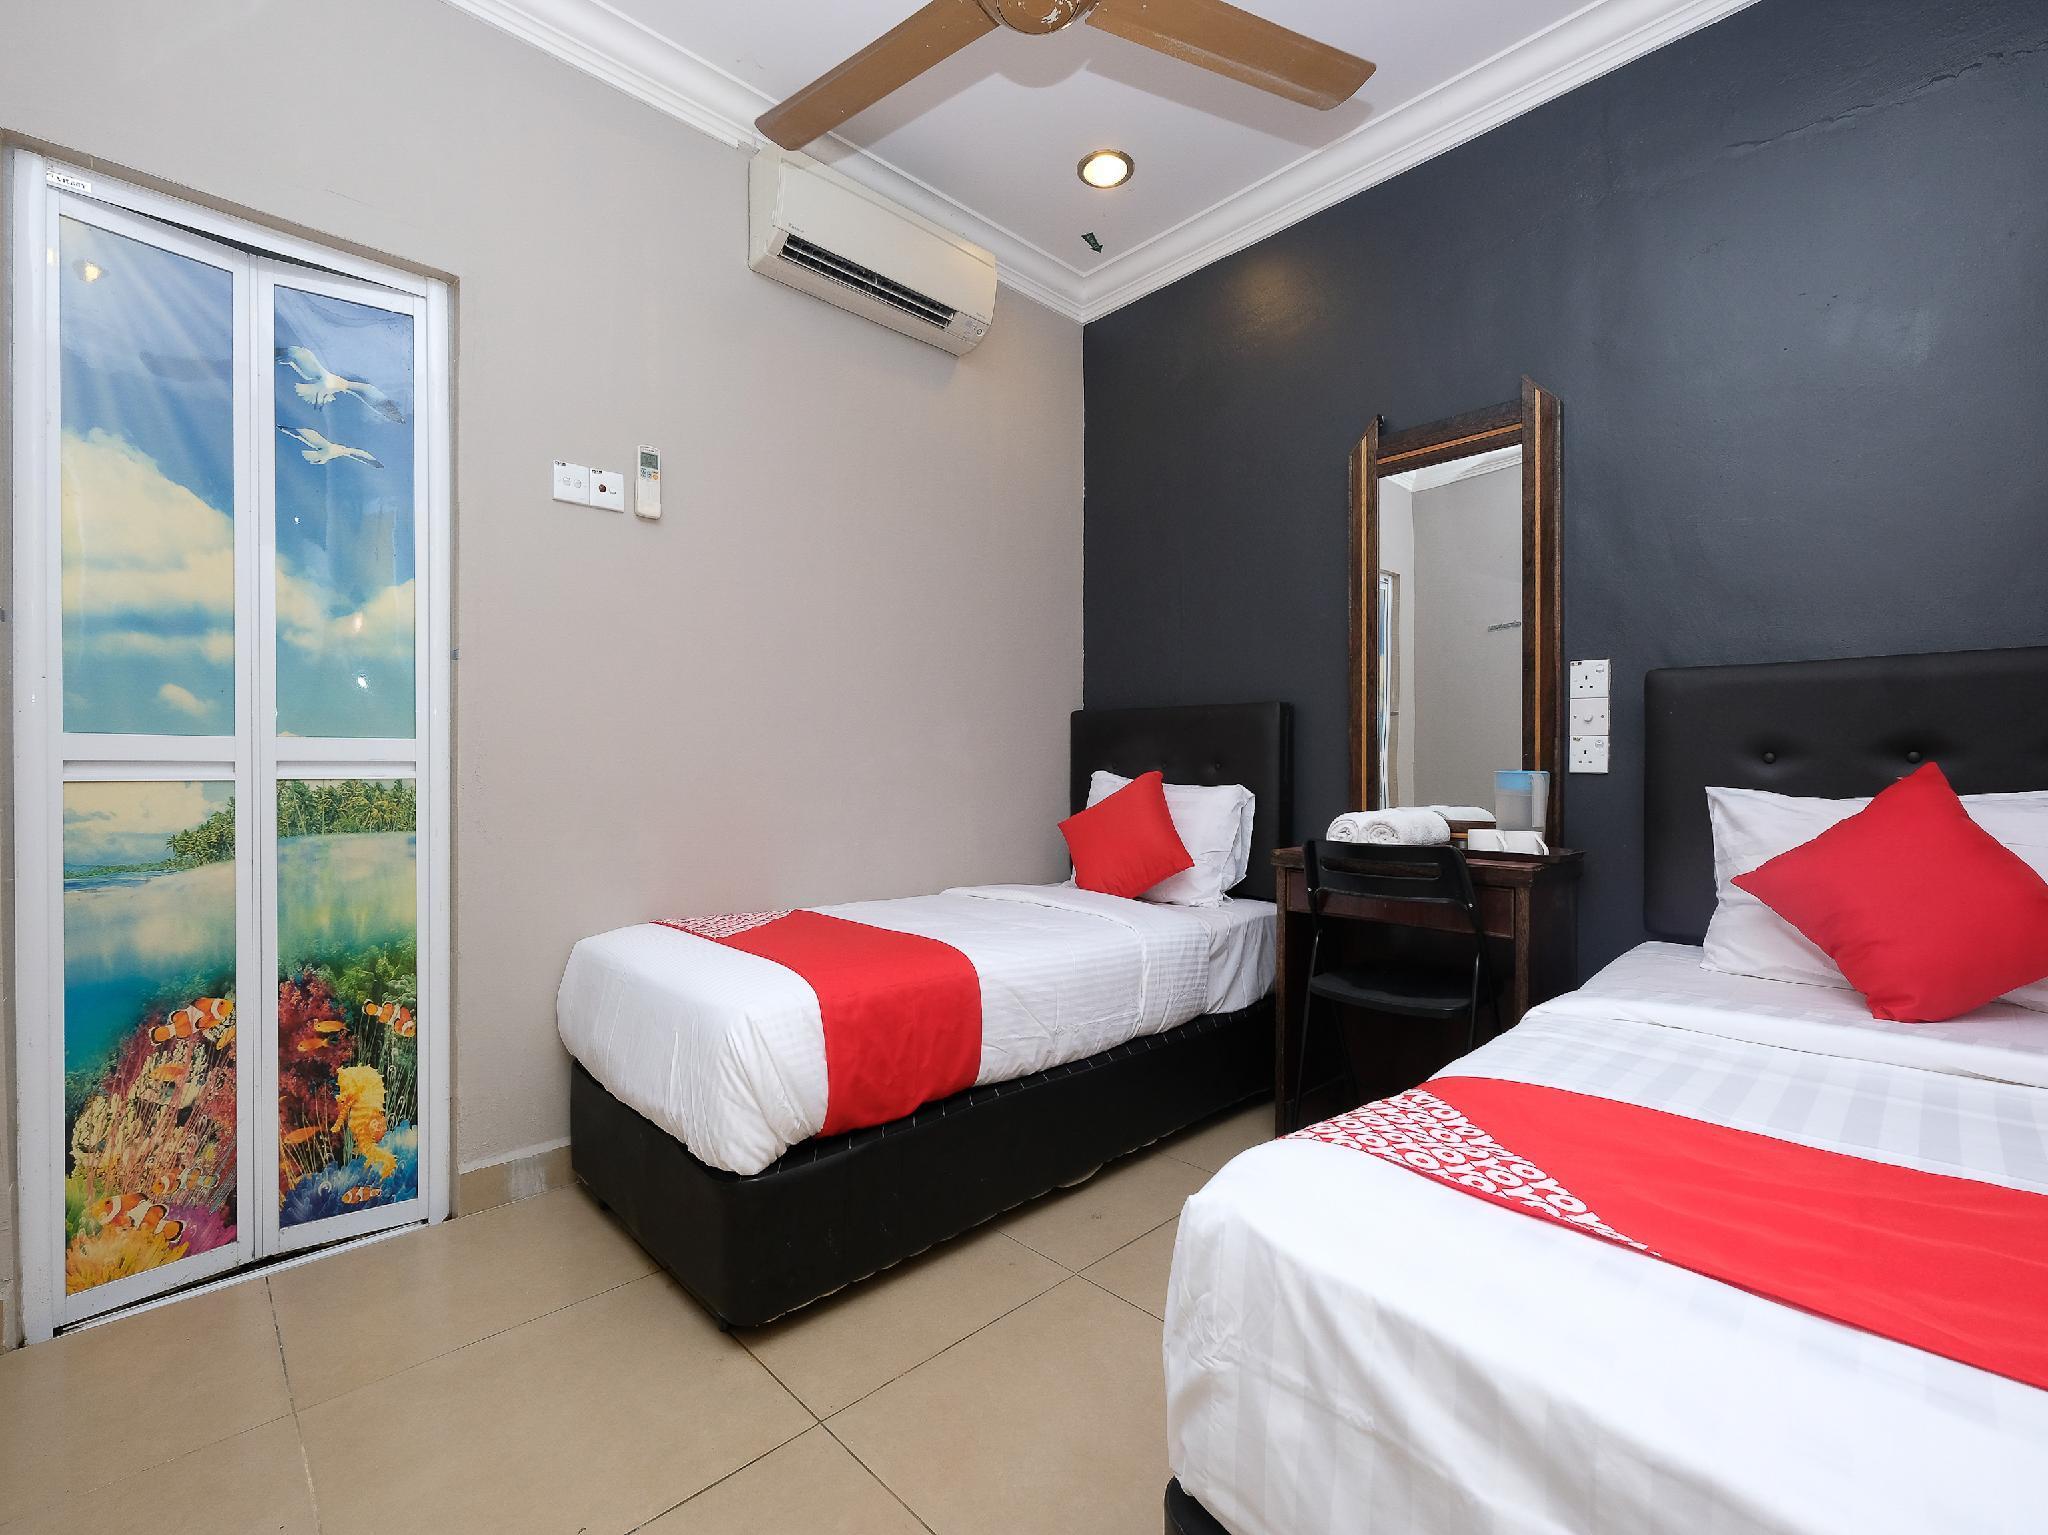 OYO 1190 Nice Stay hotel